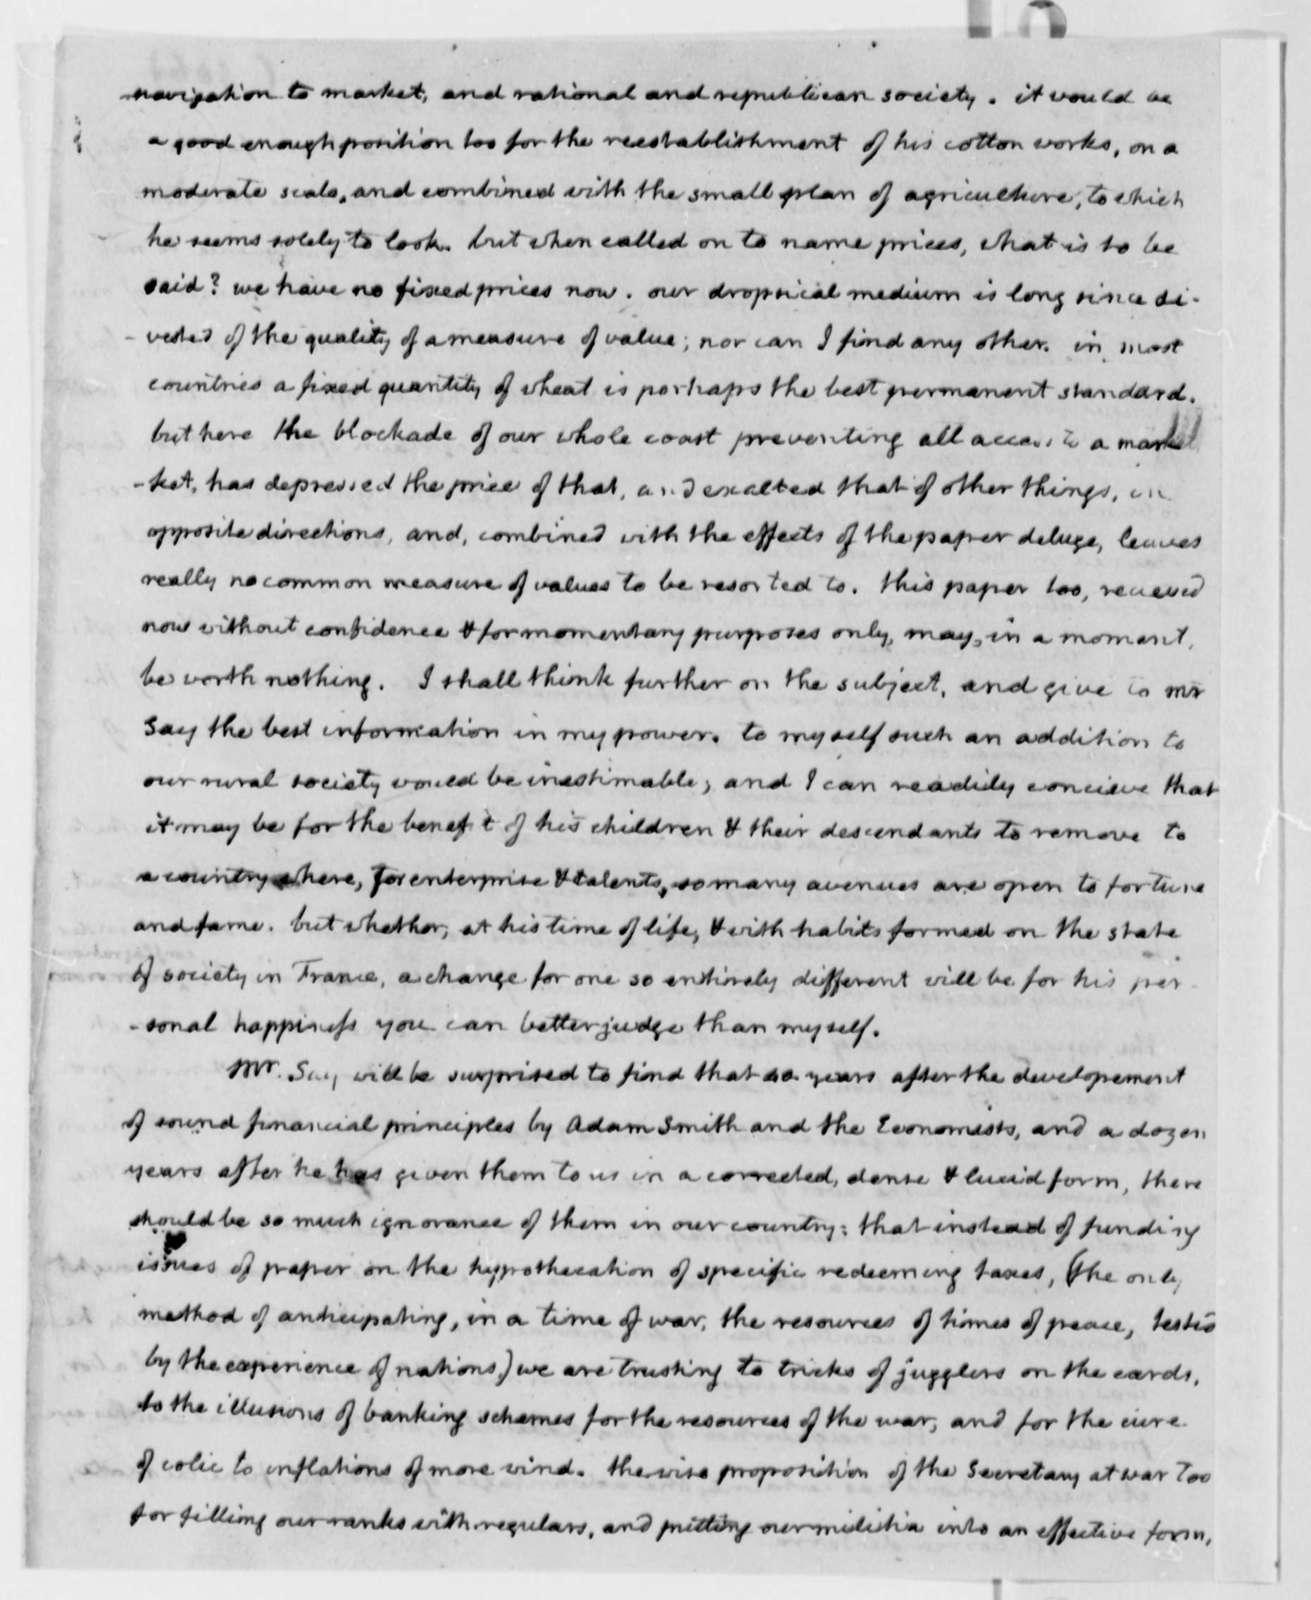 Jose Correa da Serra to Thomas Jefferson, December 27, 1814